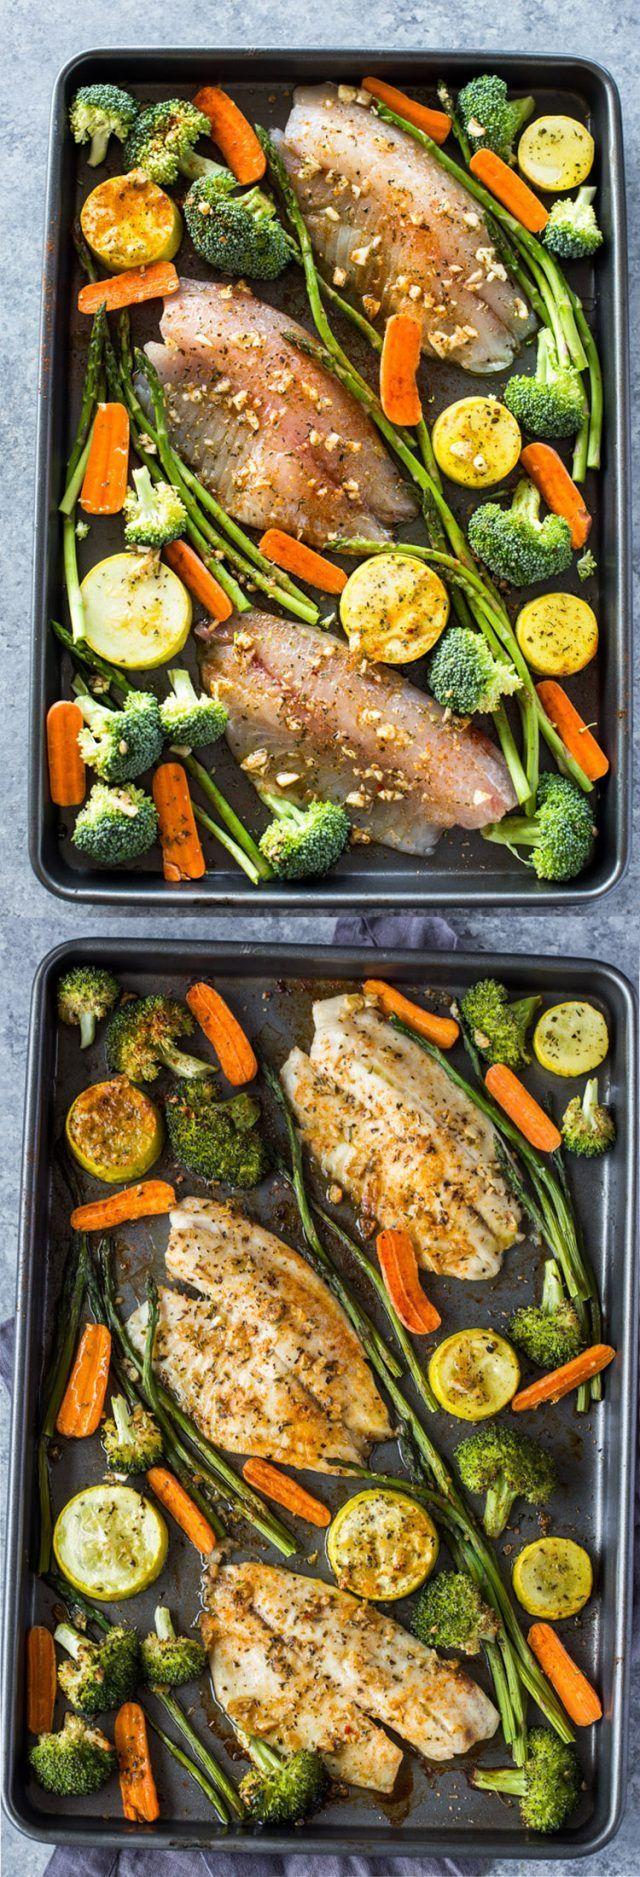 Healthy Sheet Pan Tilapia and Veggies + Meal-Prep images